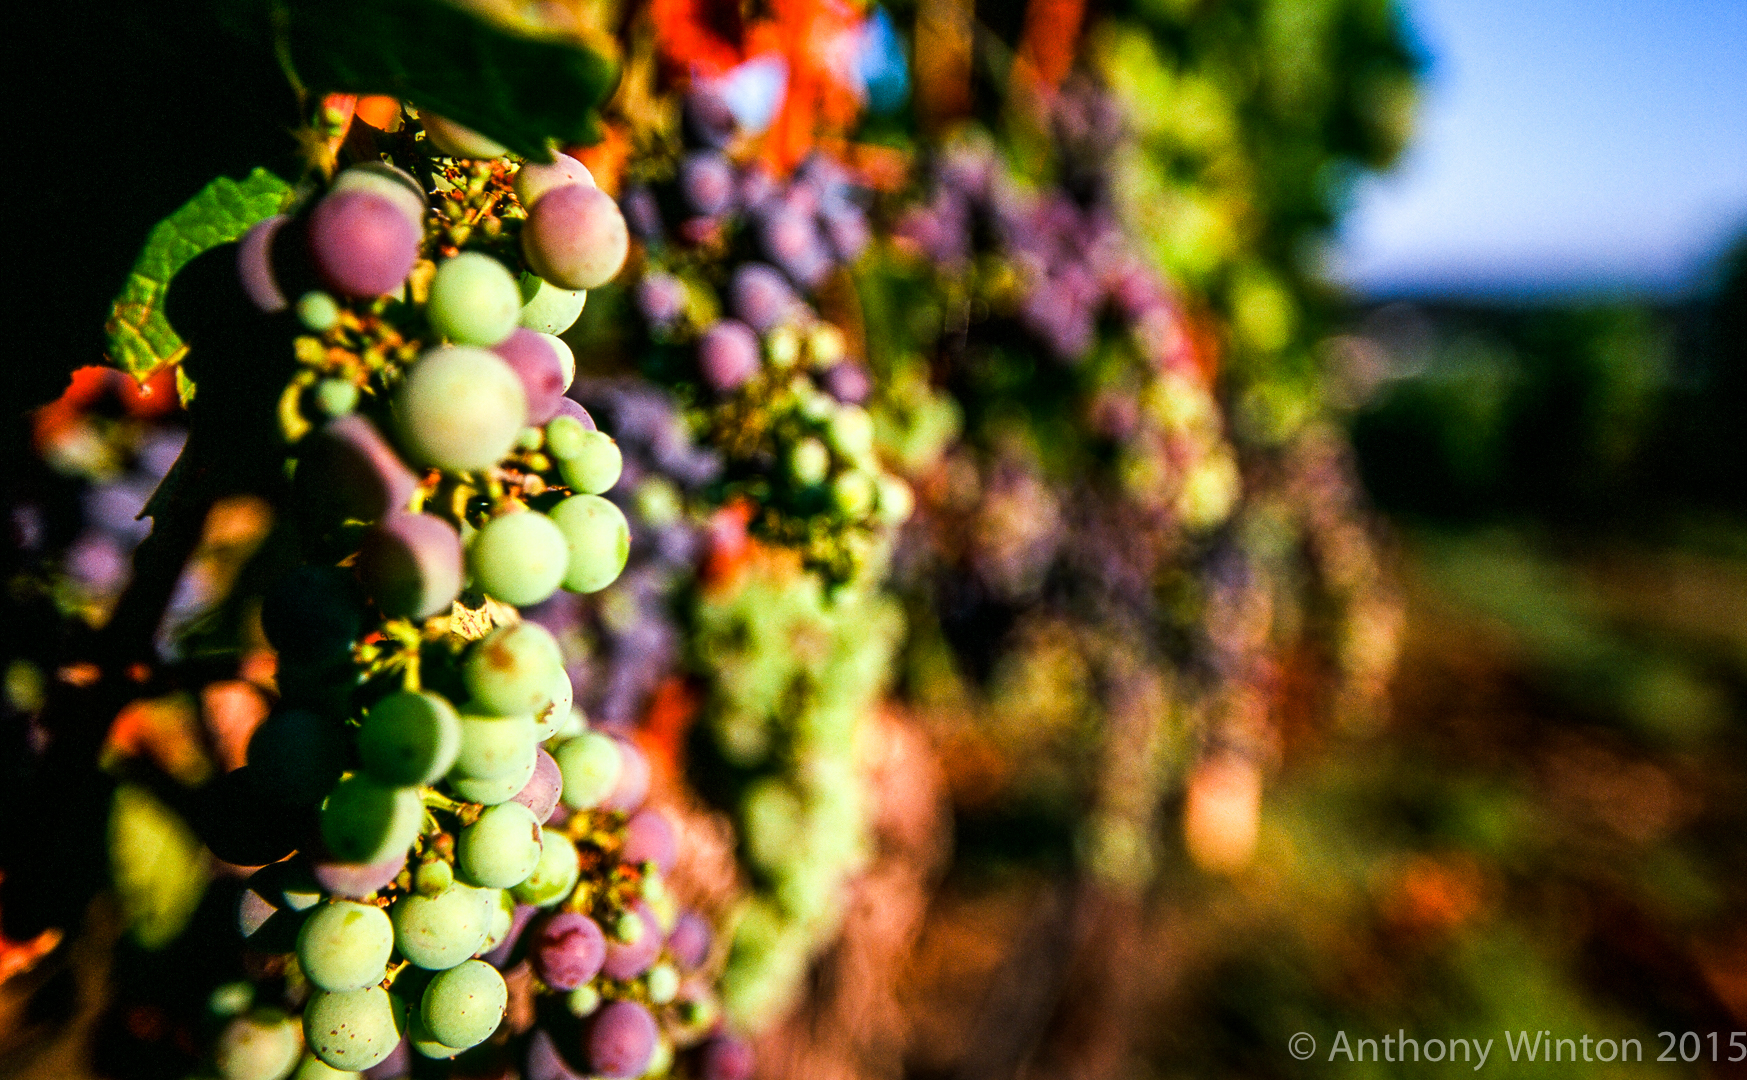 Ripening Harvest, Napa